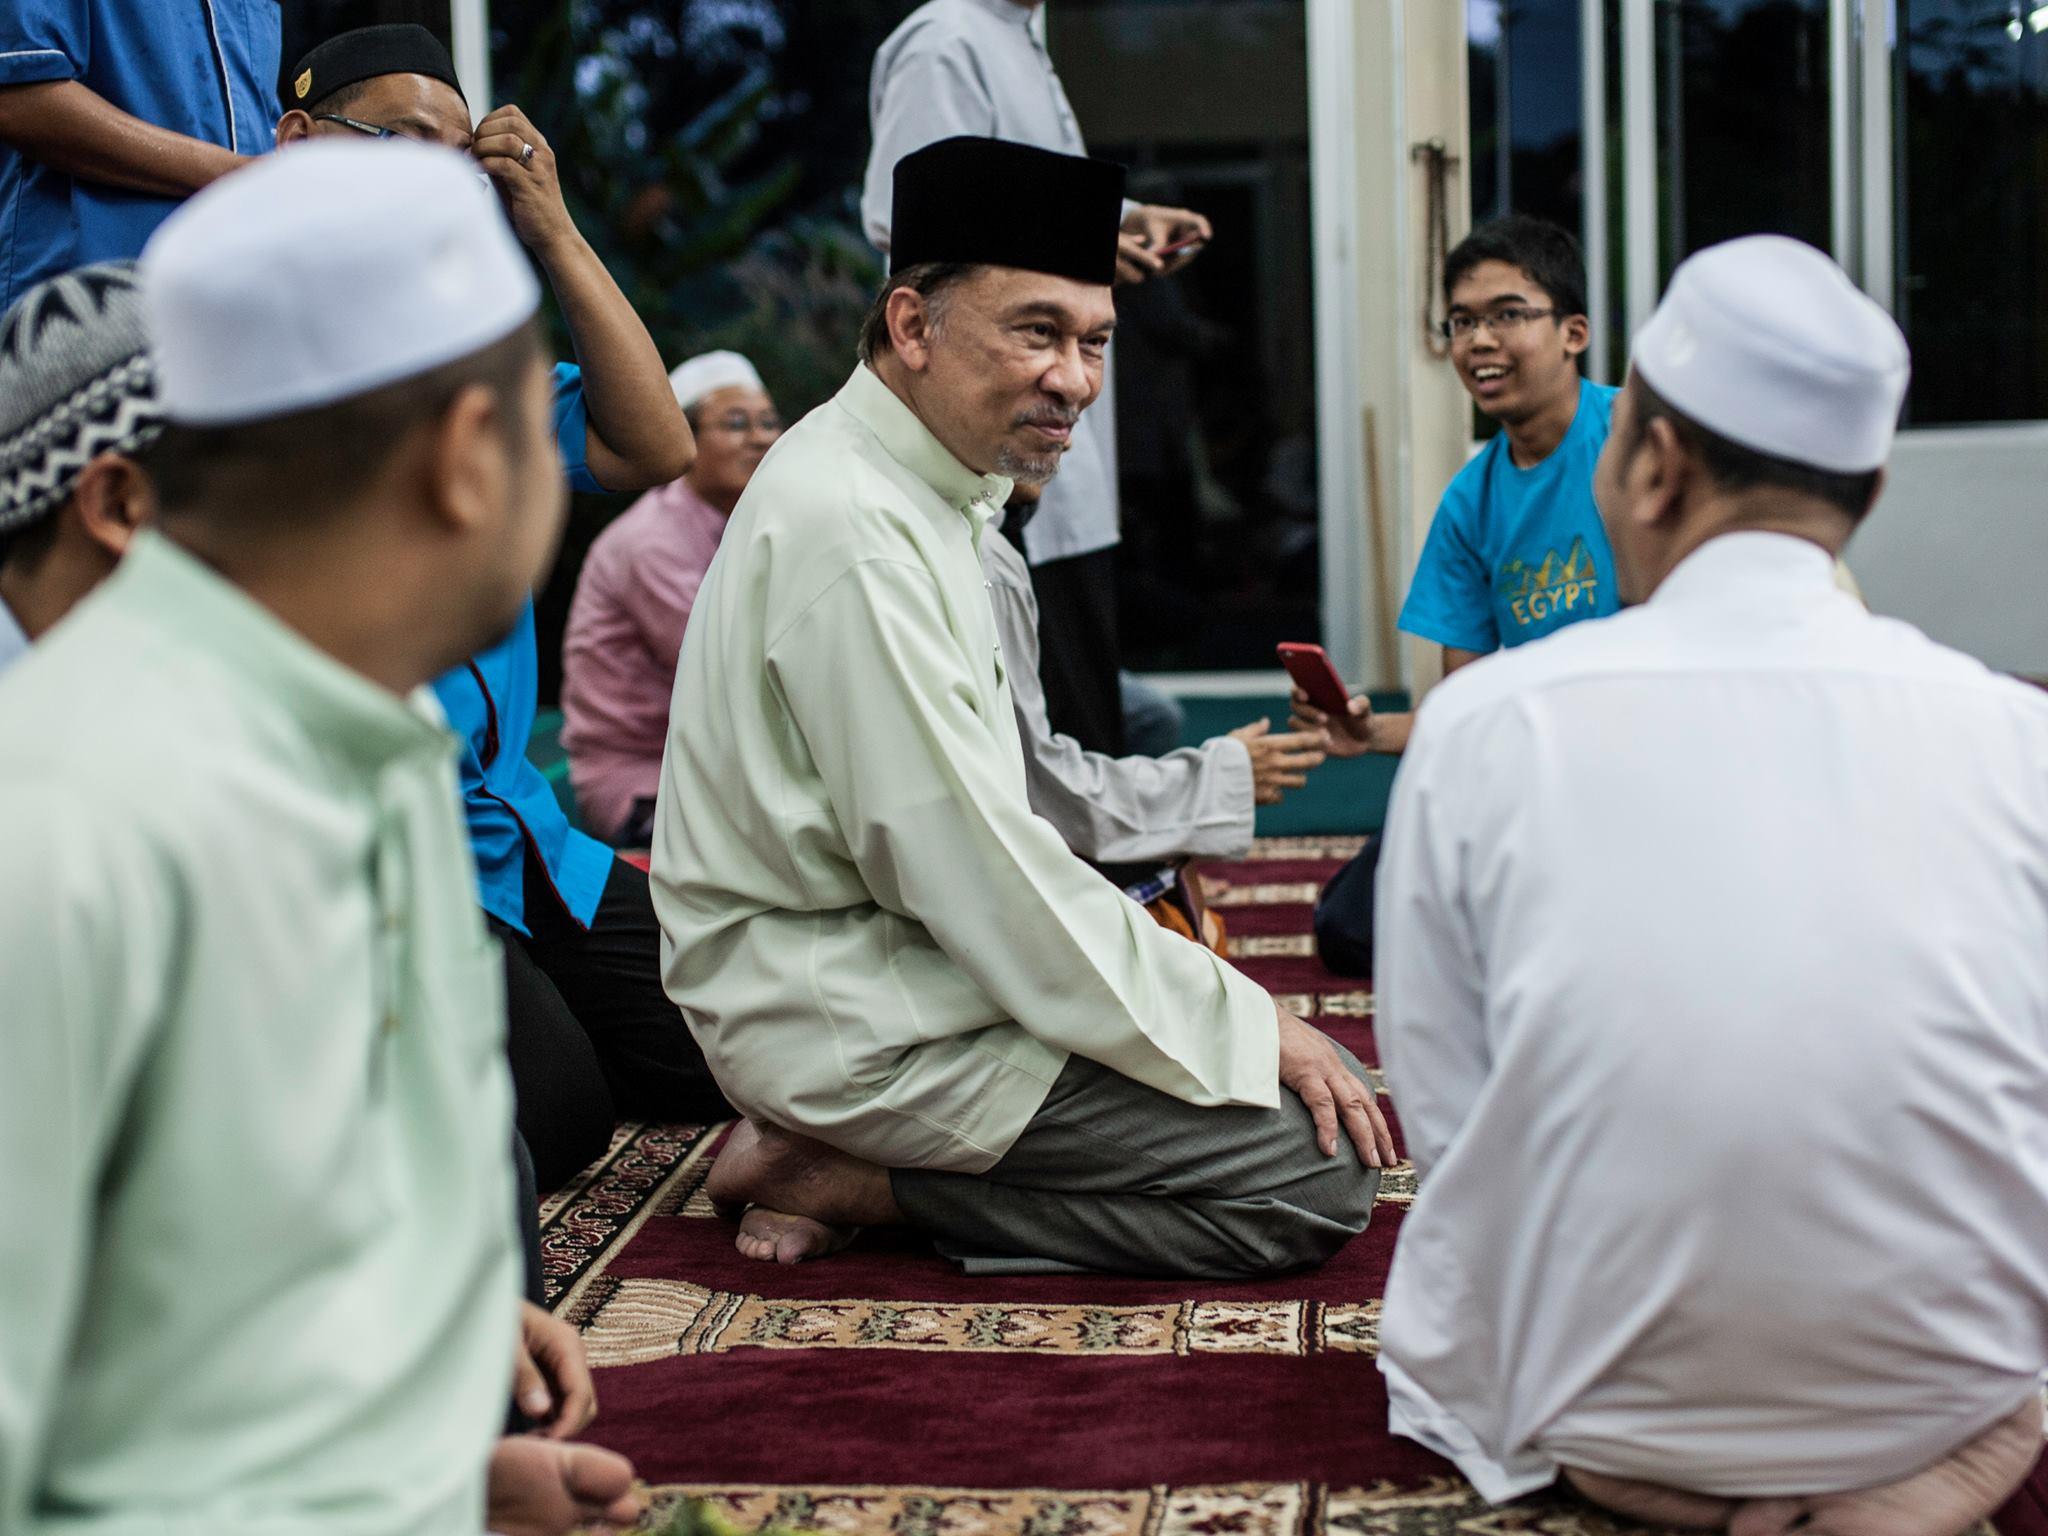 Anwar Ibrahim: Peningkatan Jumlah Muflis dan Pinjaman Peribadi, Manifestasi Kesempitan Hidup Rakyat